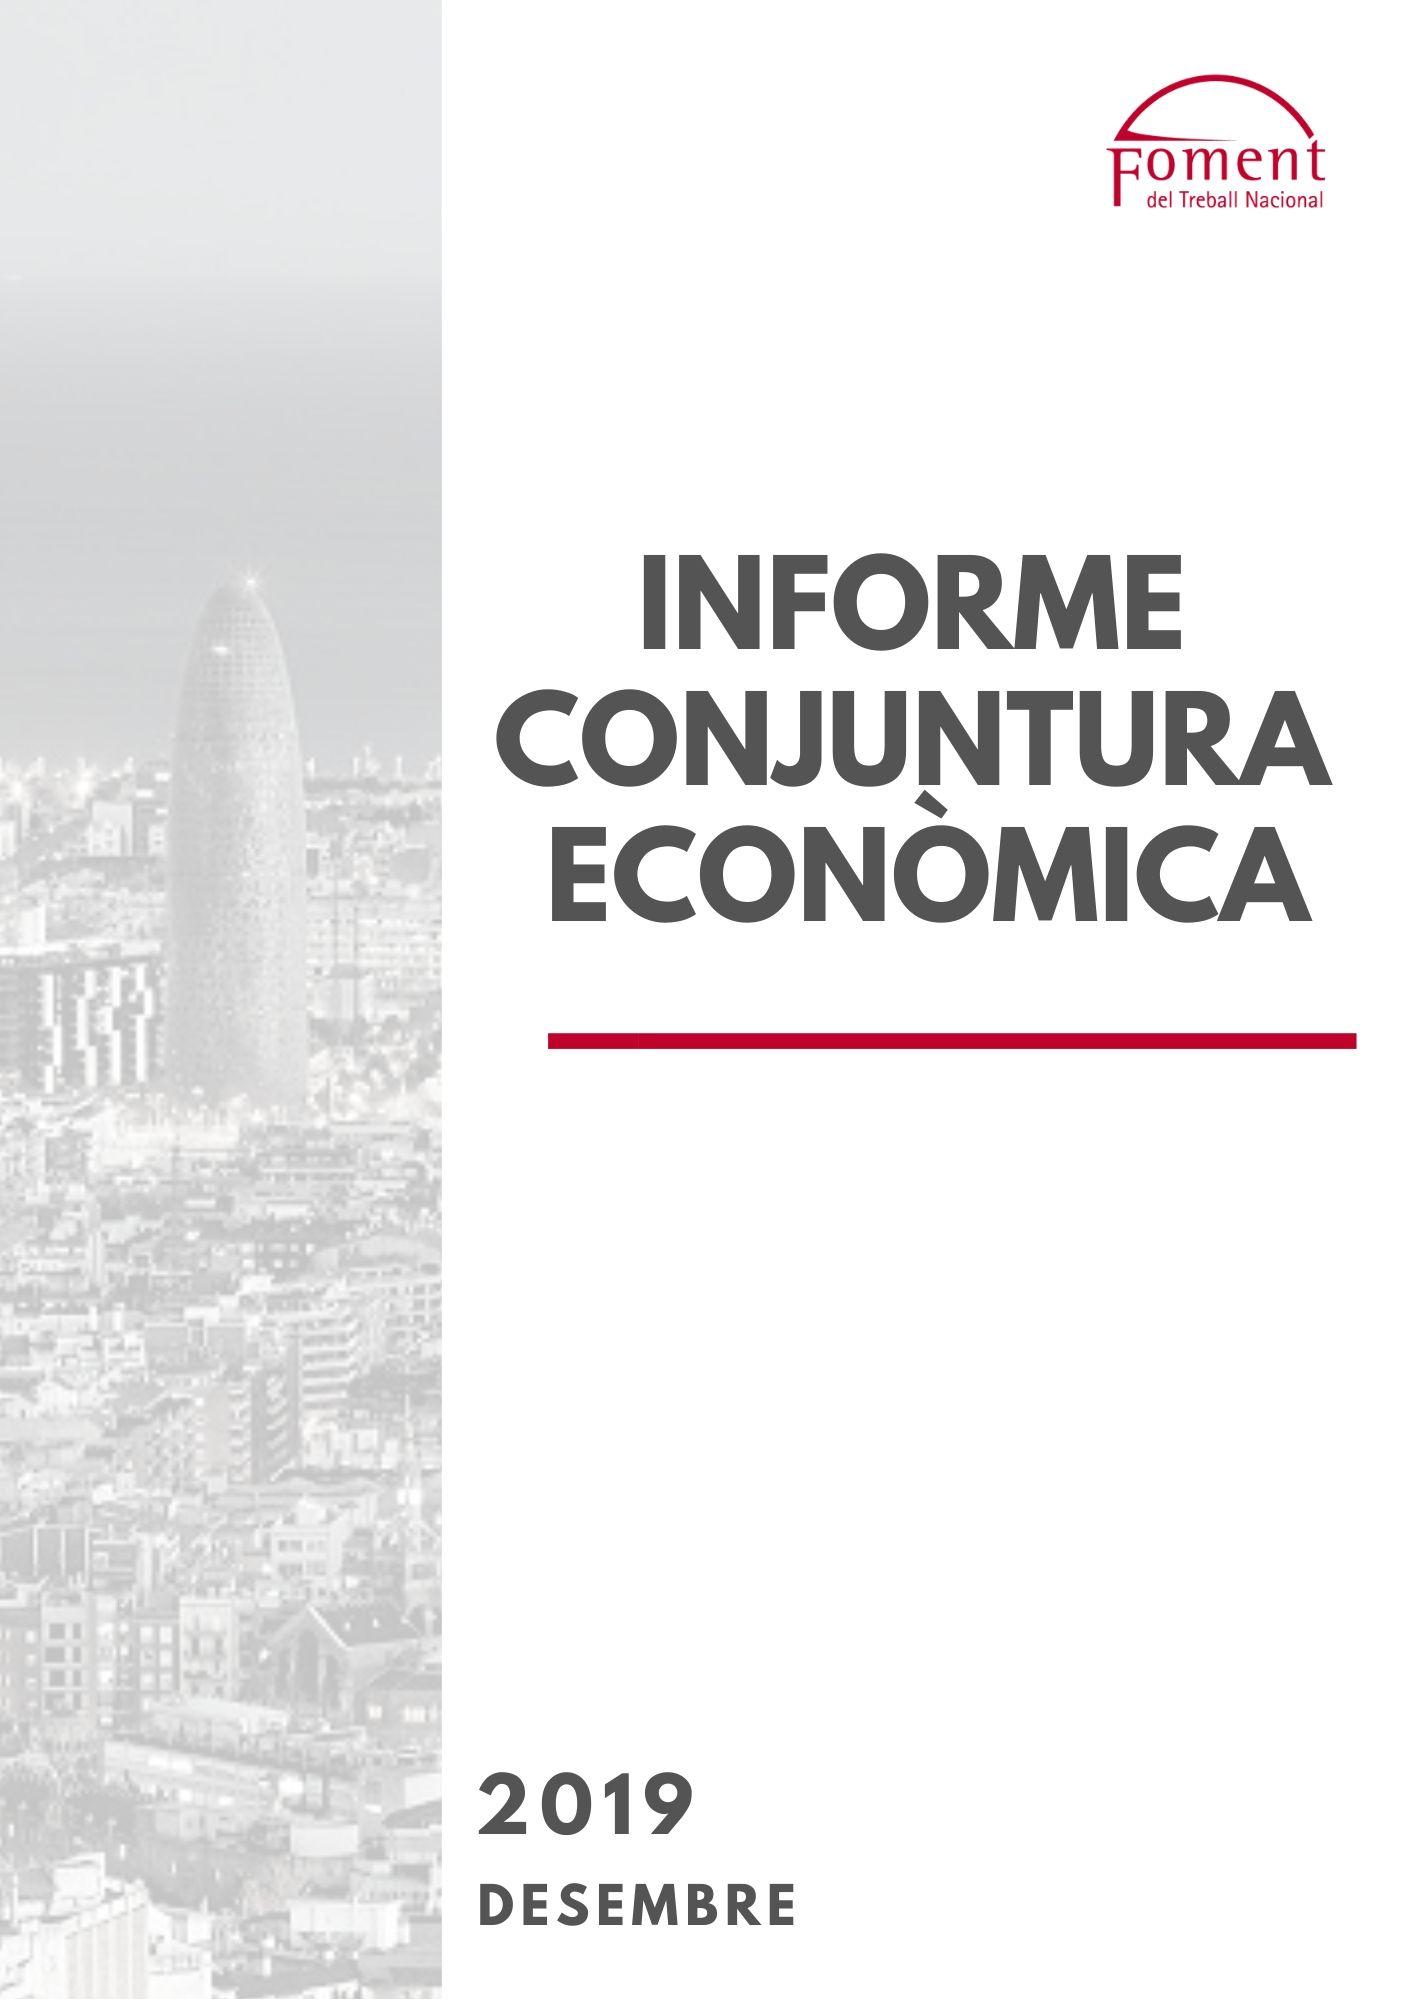 Informe Conjuntura Econòmica- Desembre 2019